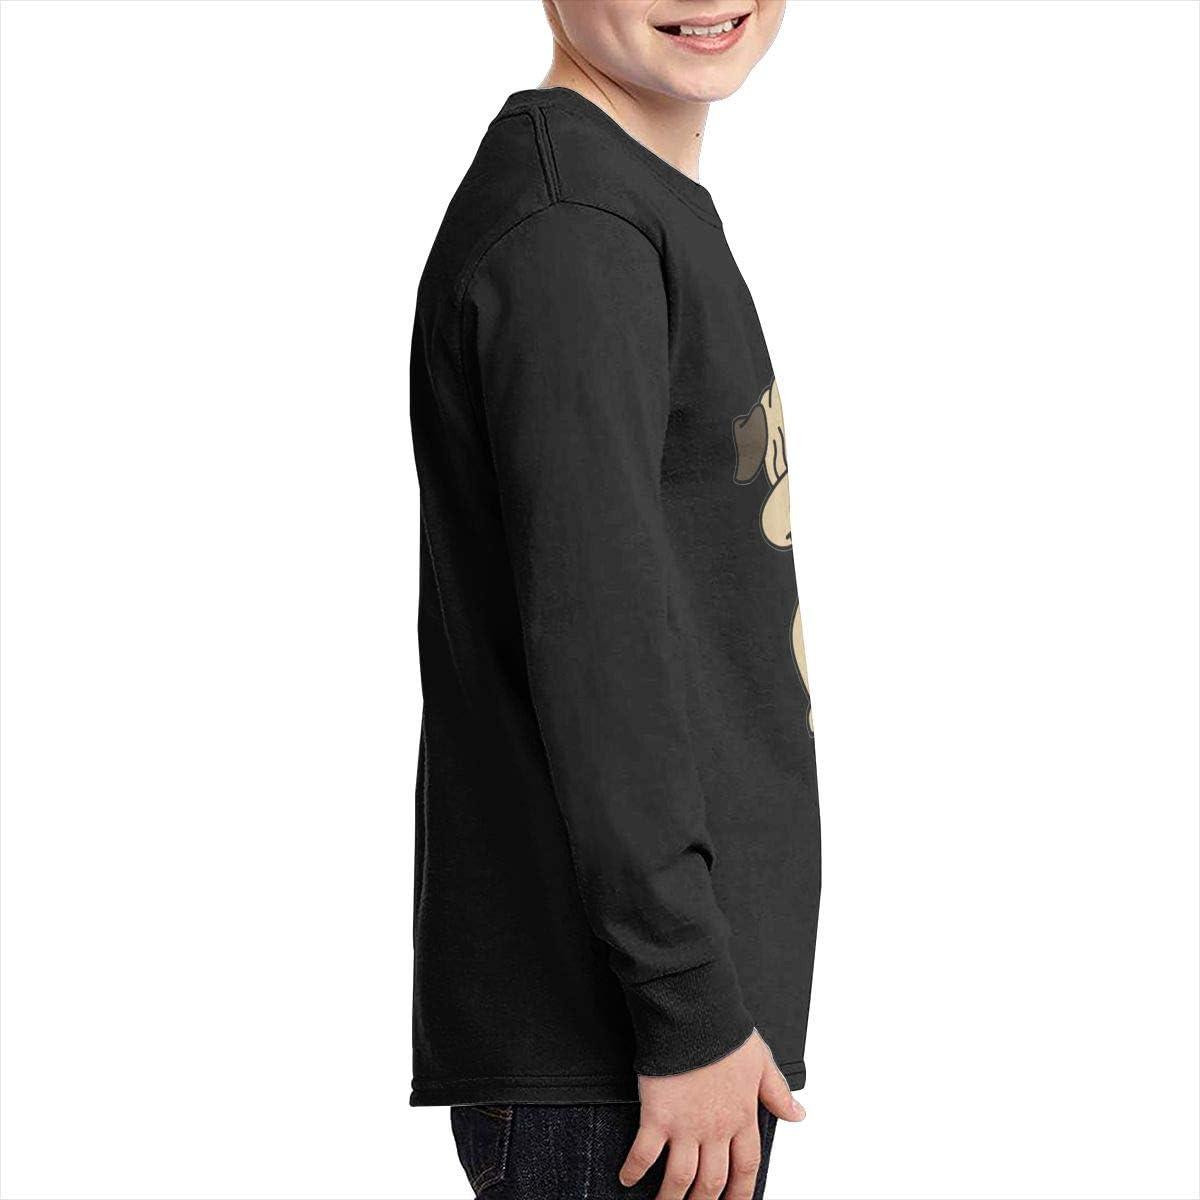 ZHAN-pcc Dabbing Pug Boys Girls Youth Junior Classic Fashion Casual Long Sleeve Round Neck T Shirt Top Black